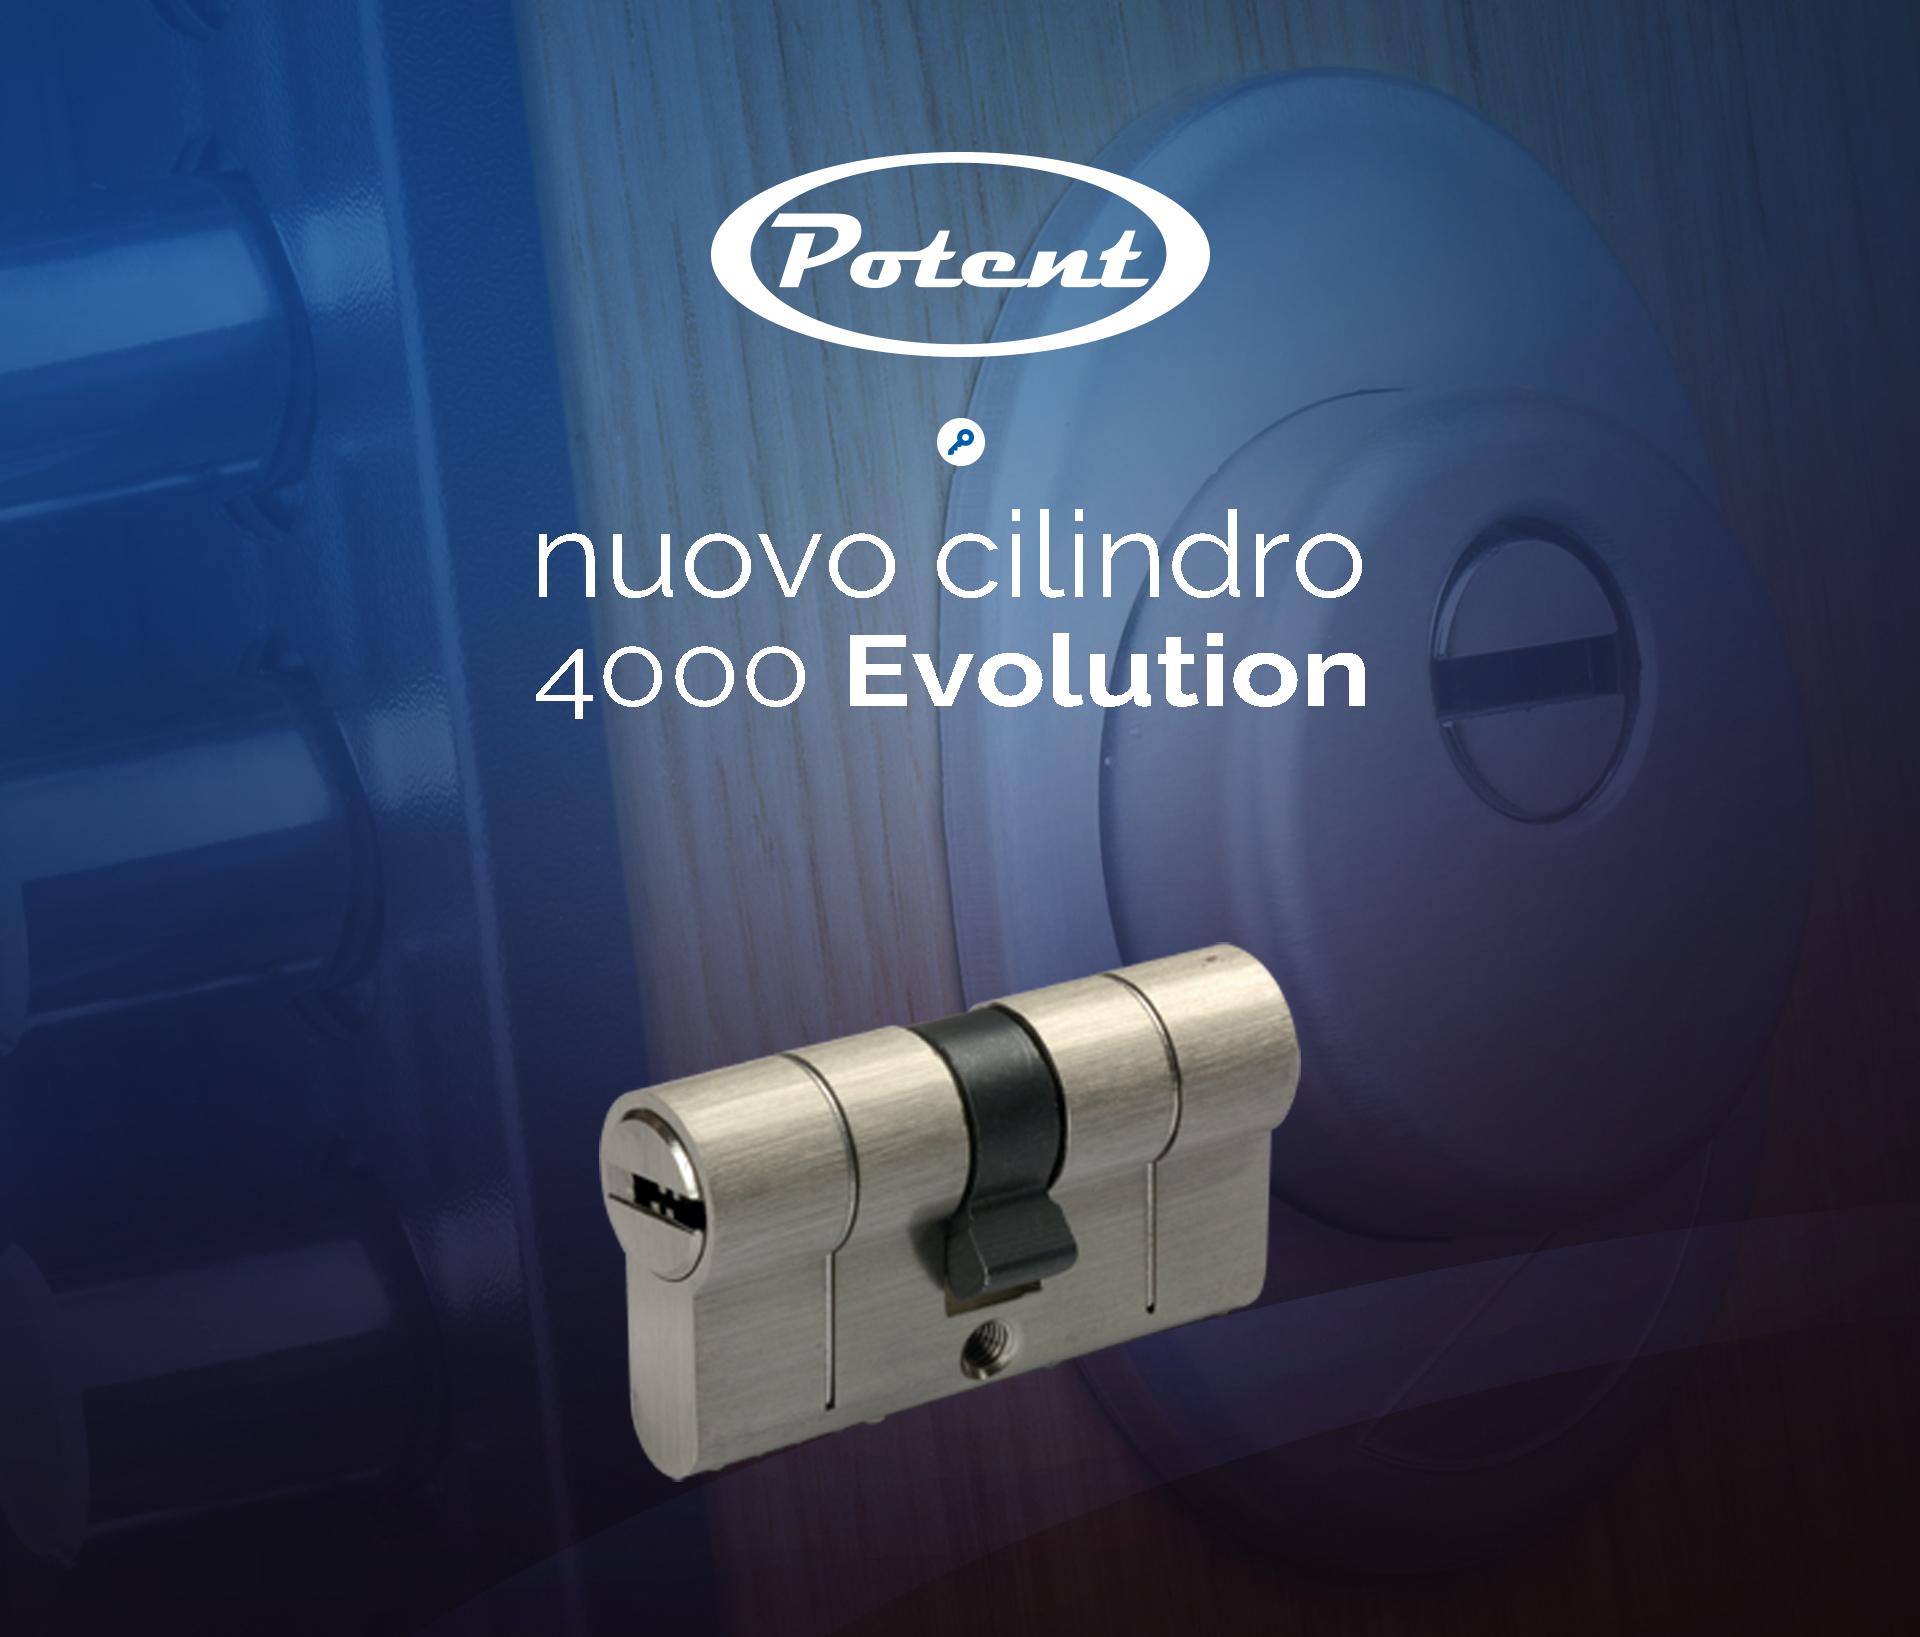 Potent nuovo cilindro 4000 evolution slider